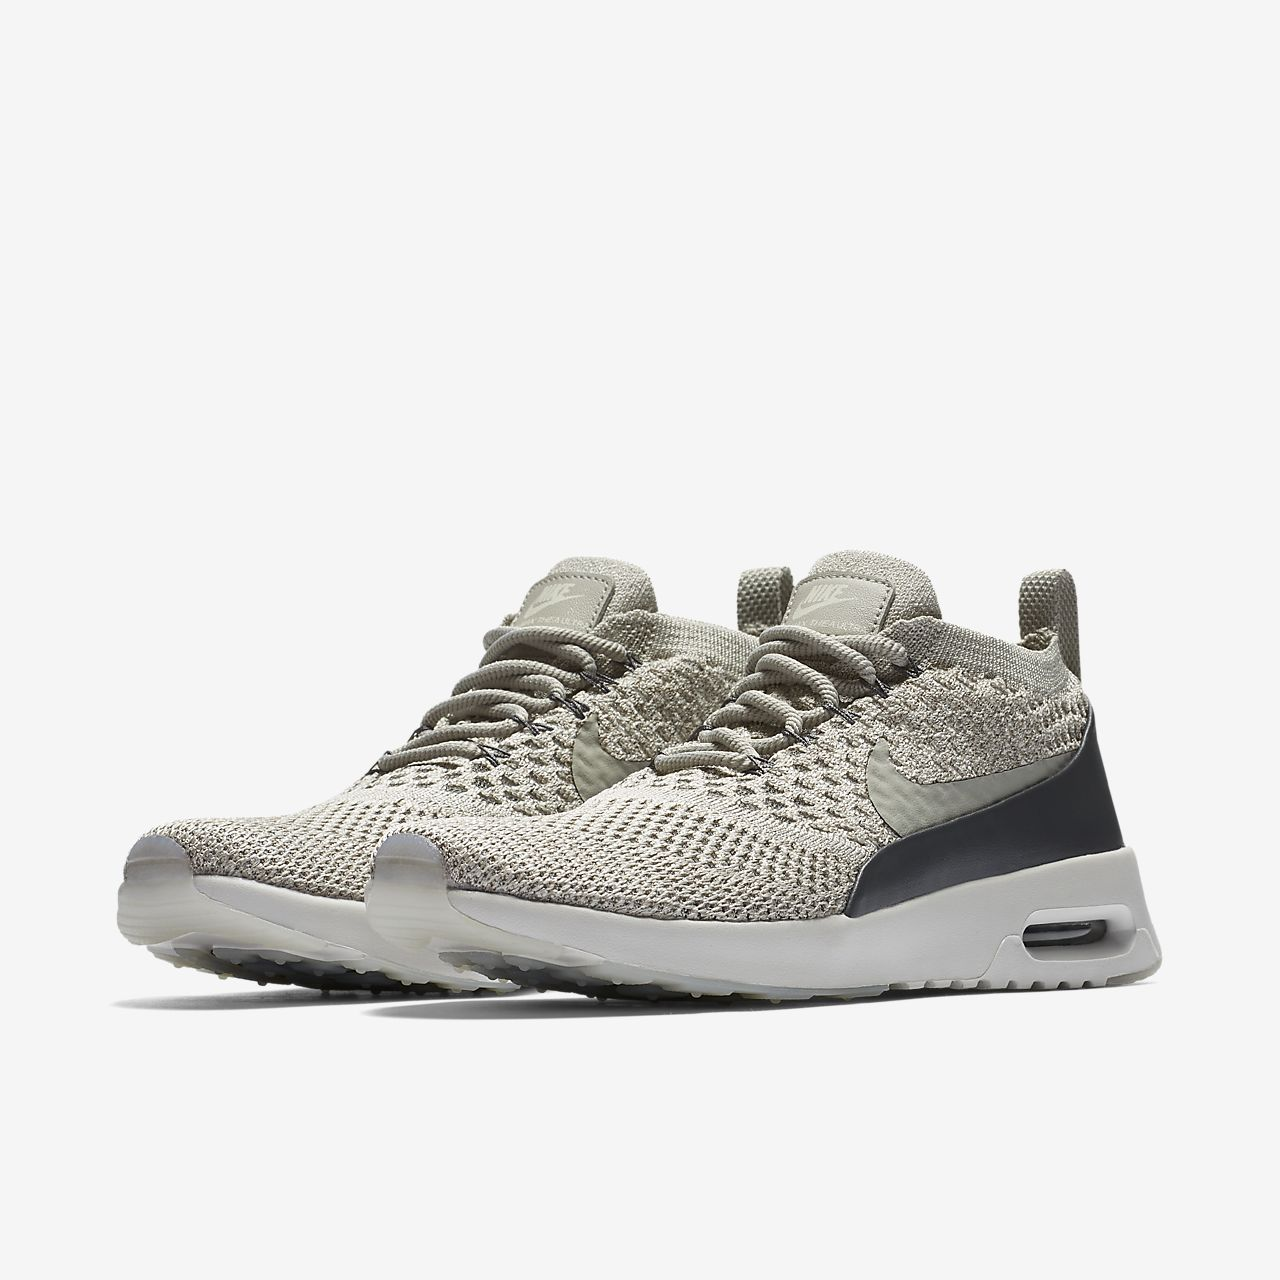 nike air max thea ultra flyknit - dames schoenen